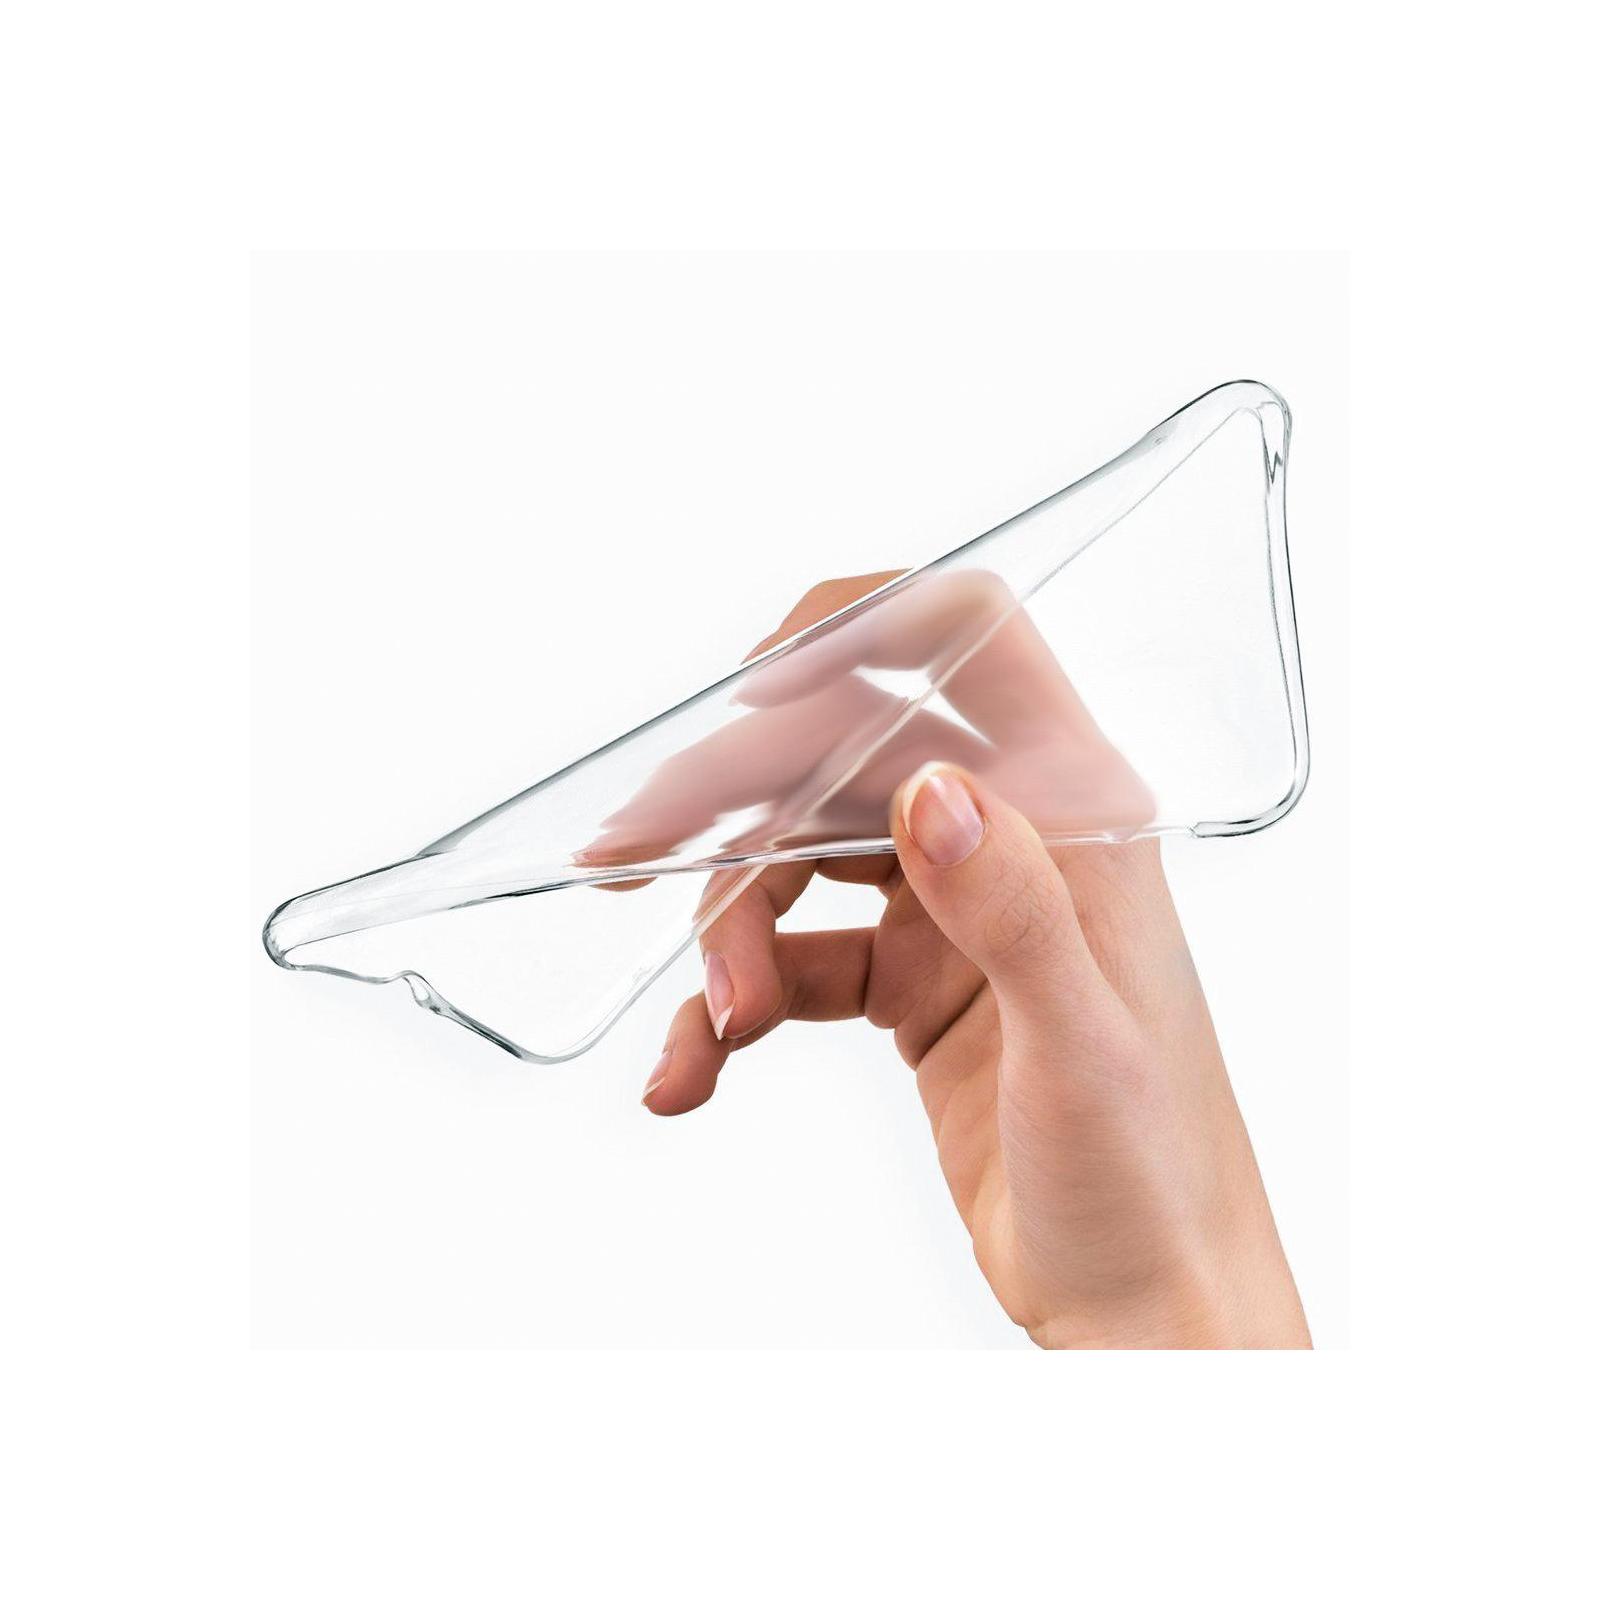 Чехол для моб. телефона SmartCase Samsung Galaxy J3 /J320 TPU Clear (SC-J320) изображение 6